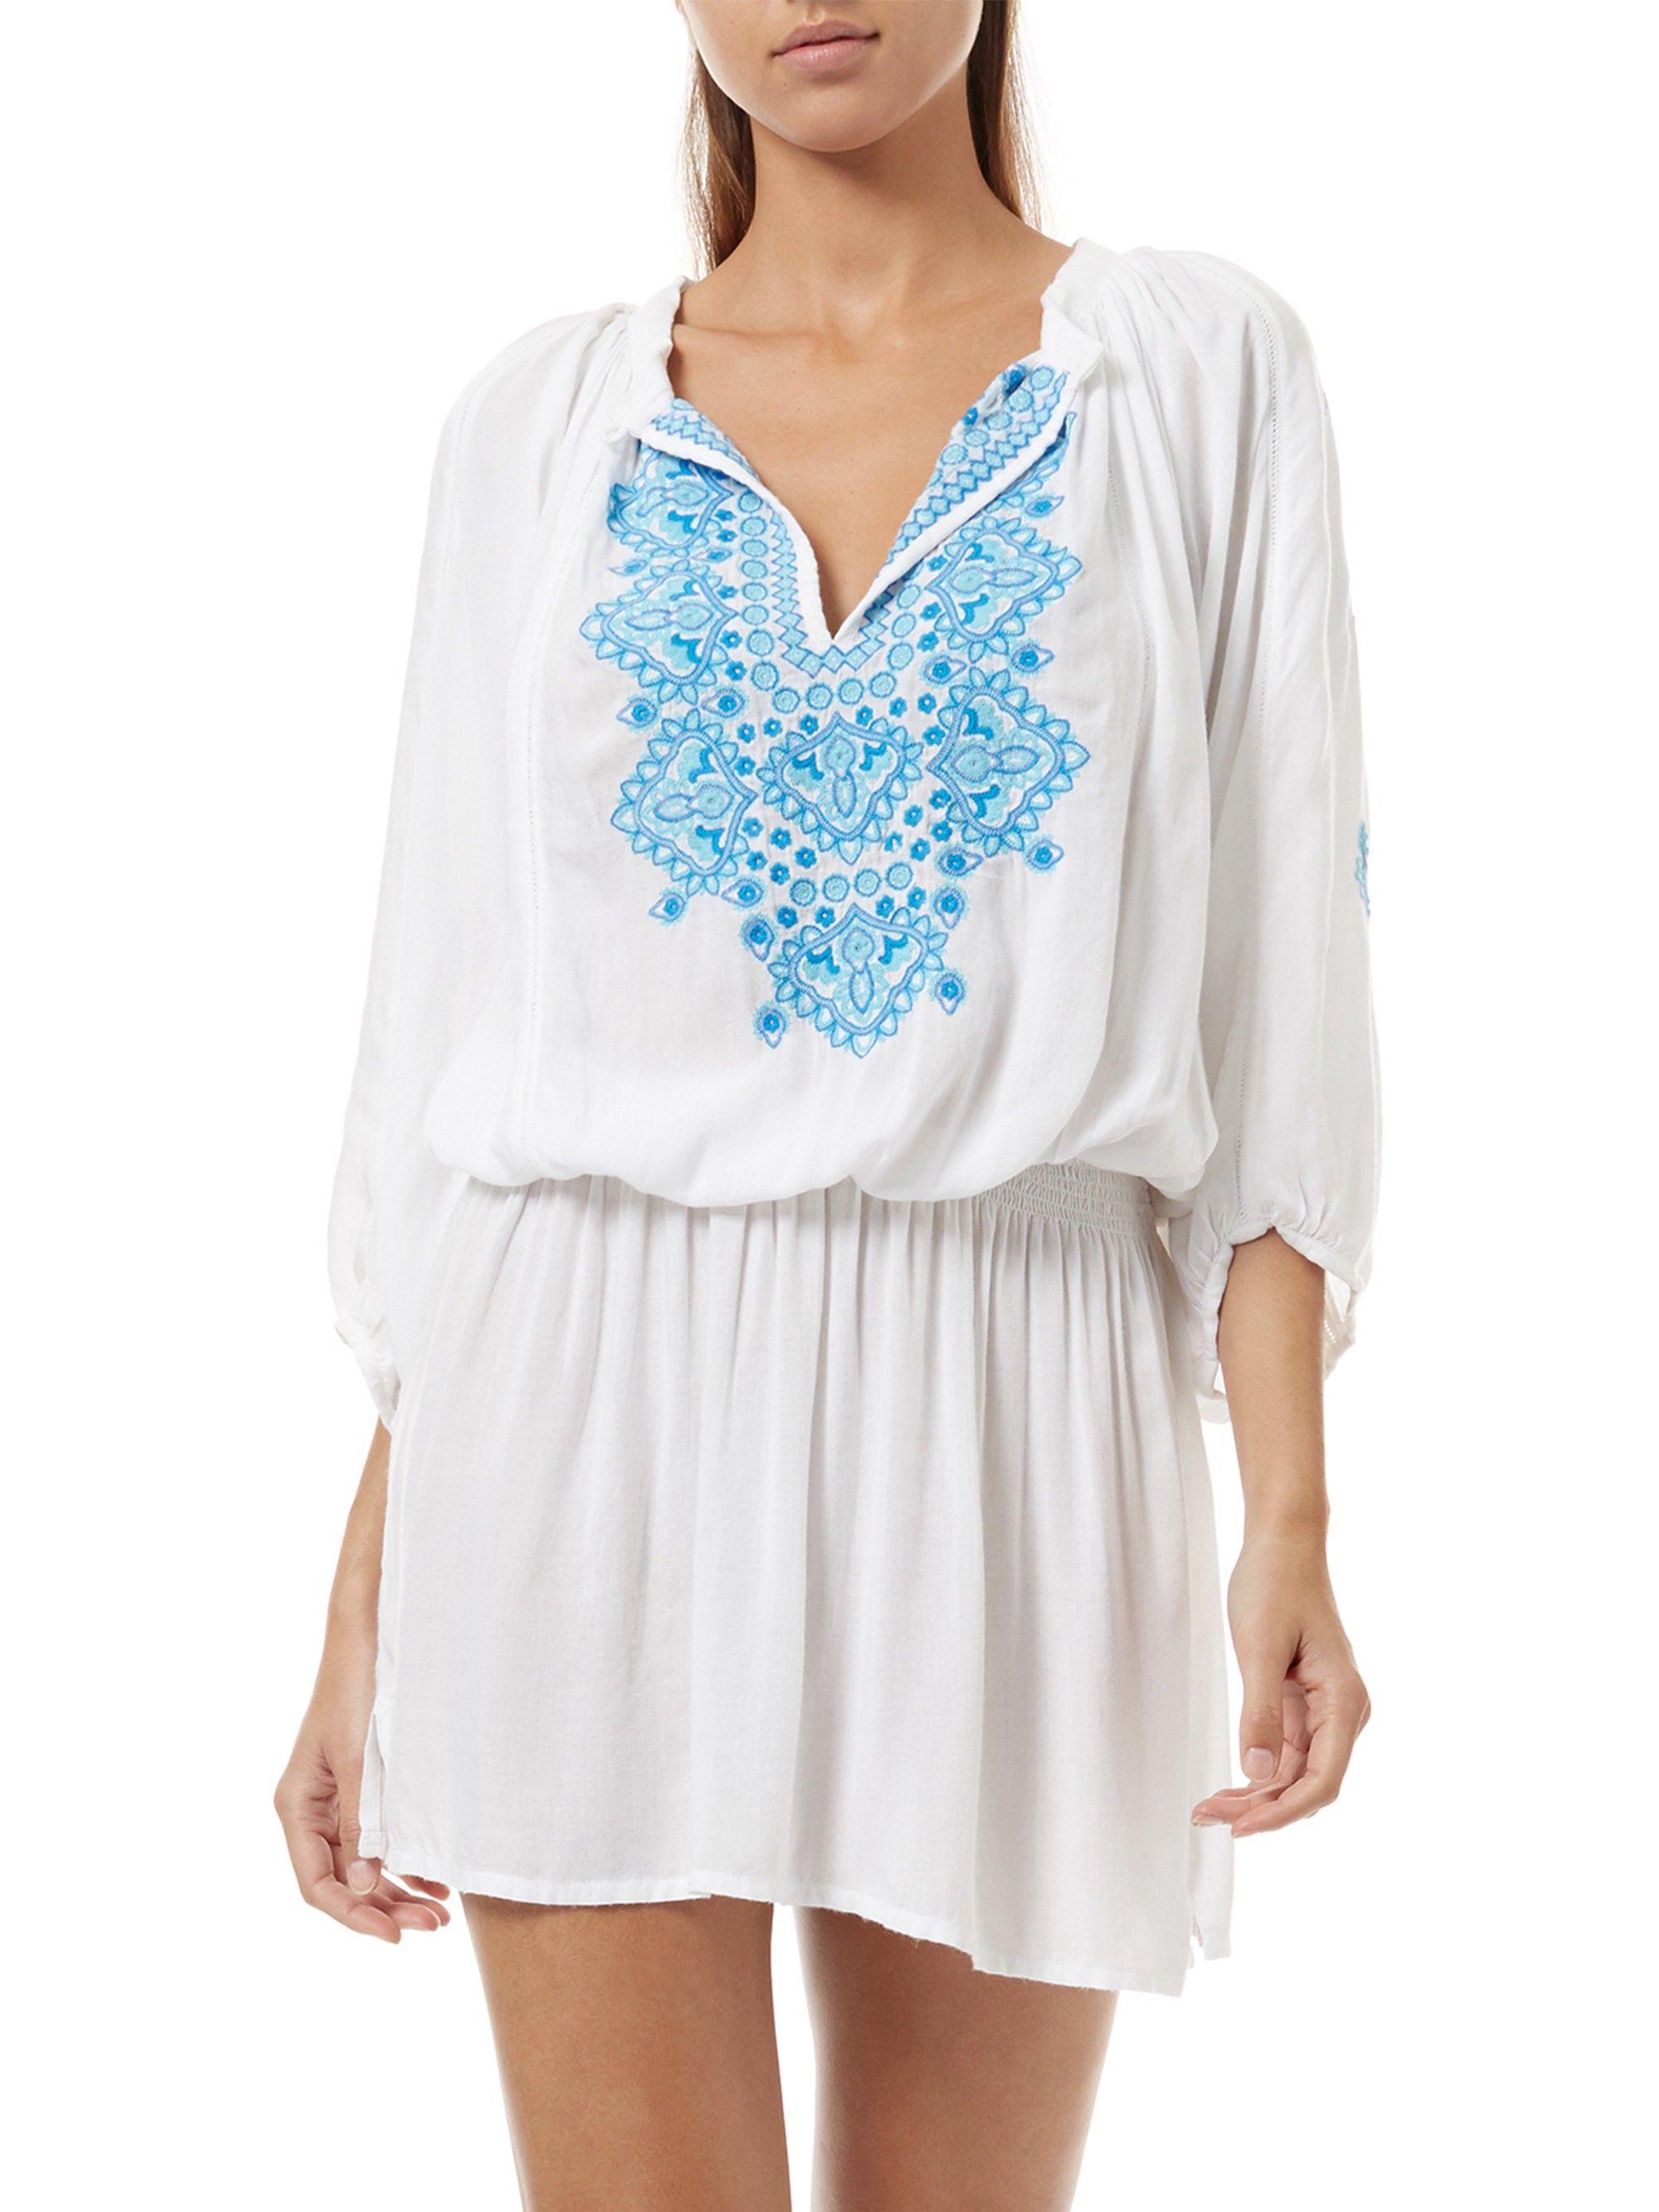 Melissa Odabash Nadja Short Tunic Dress White Small